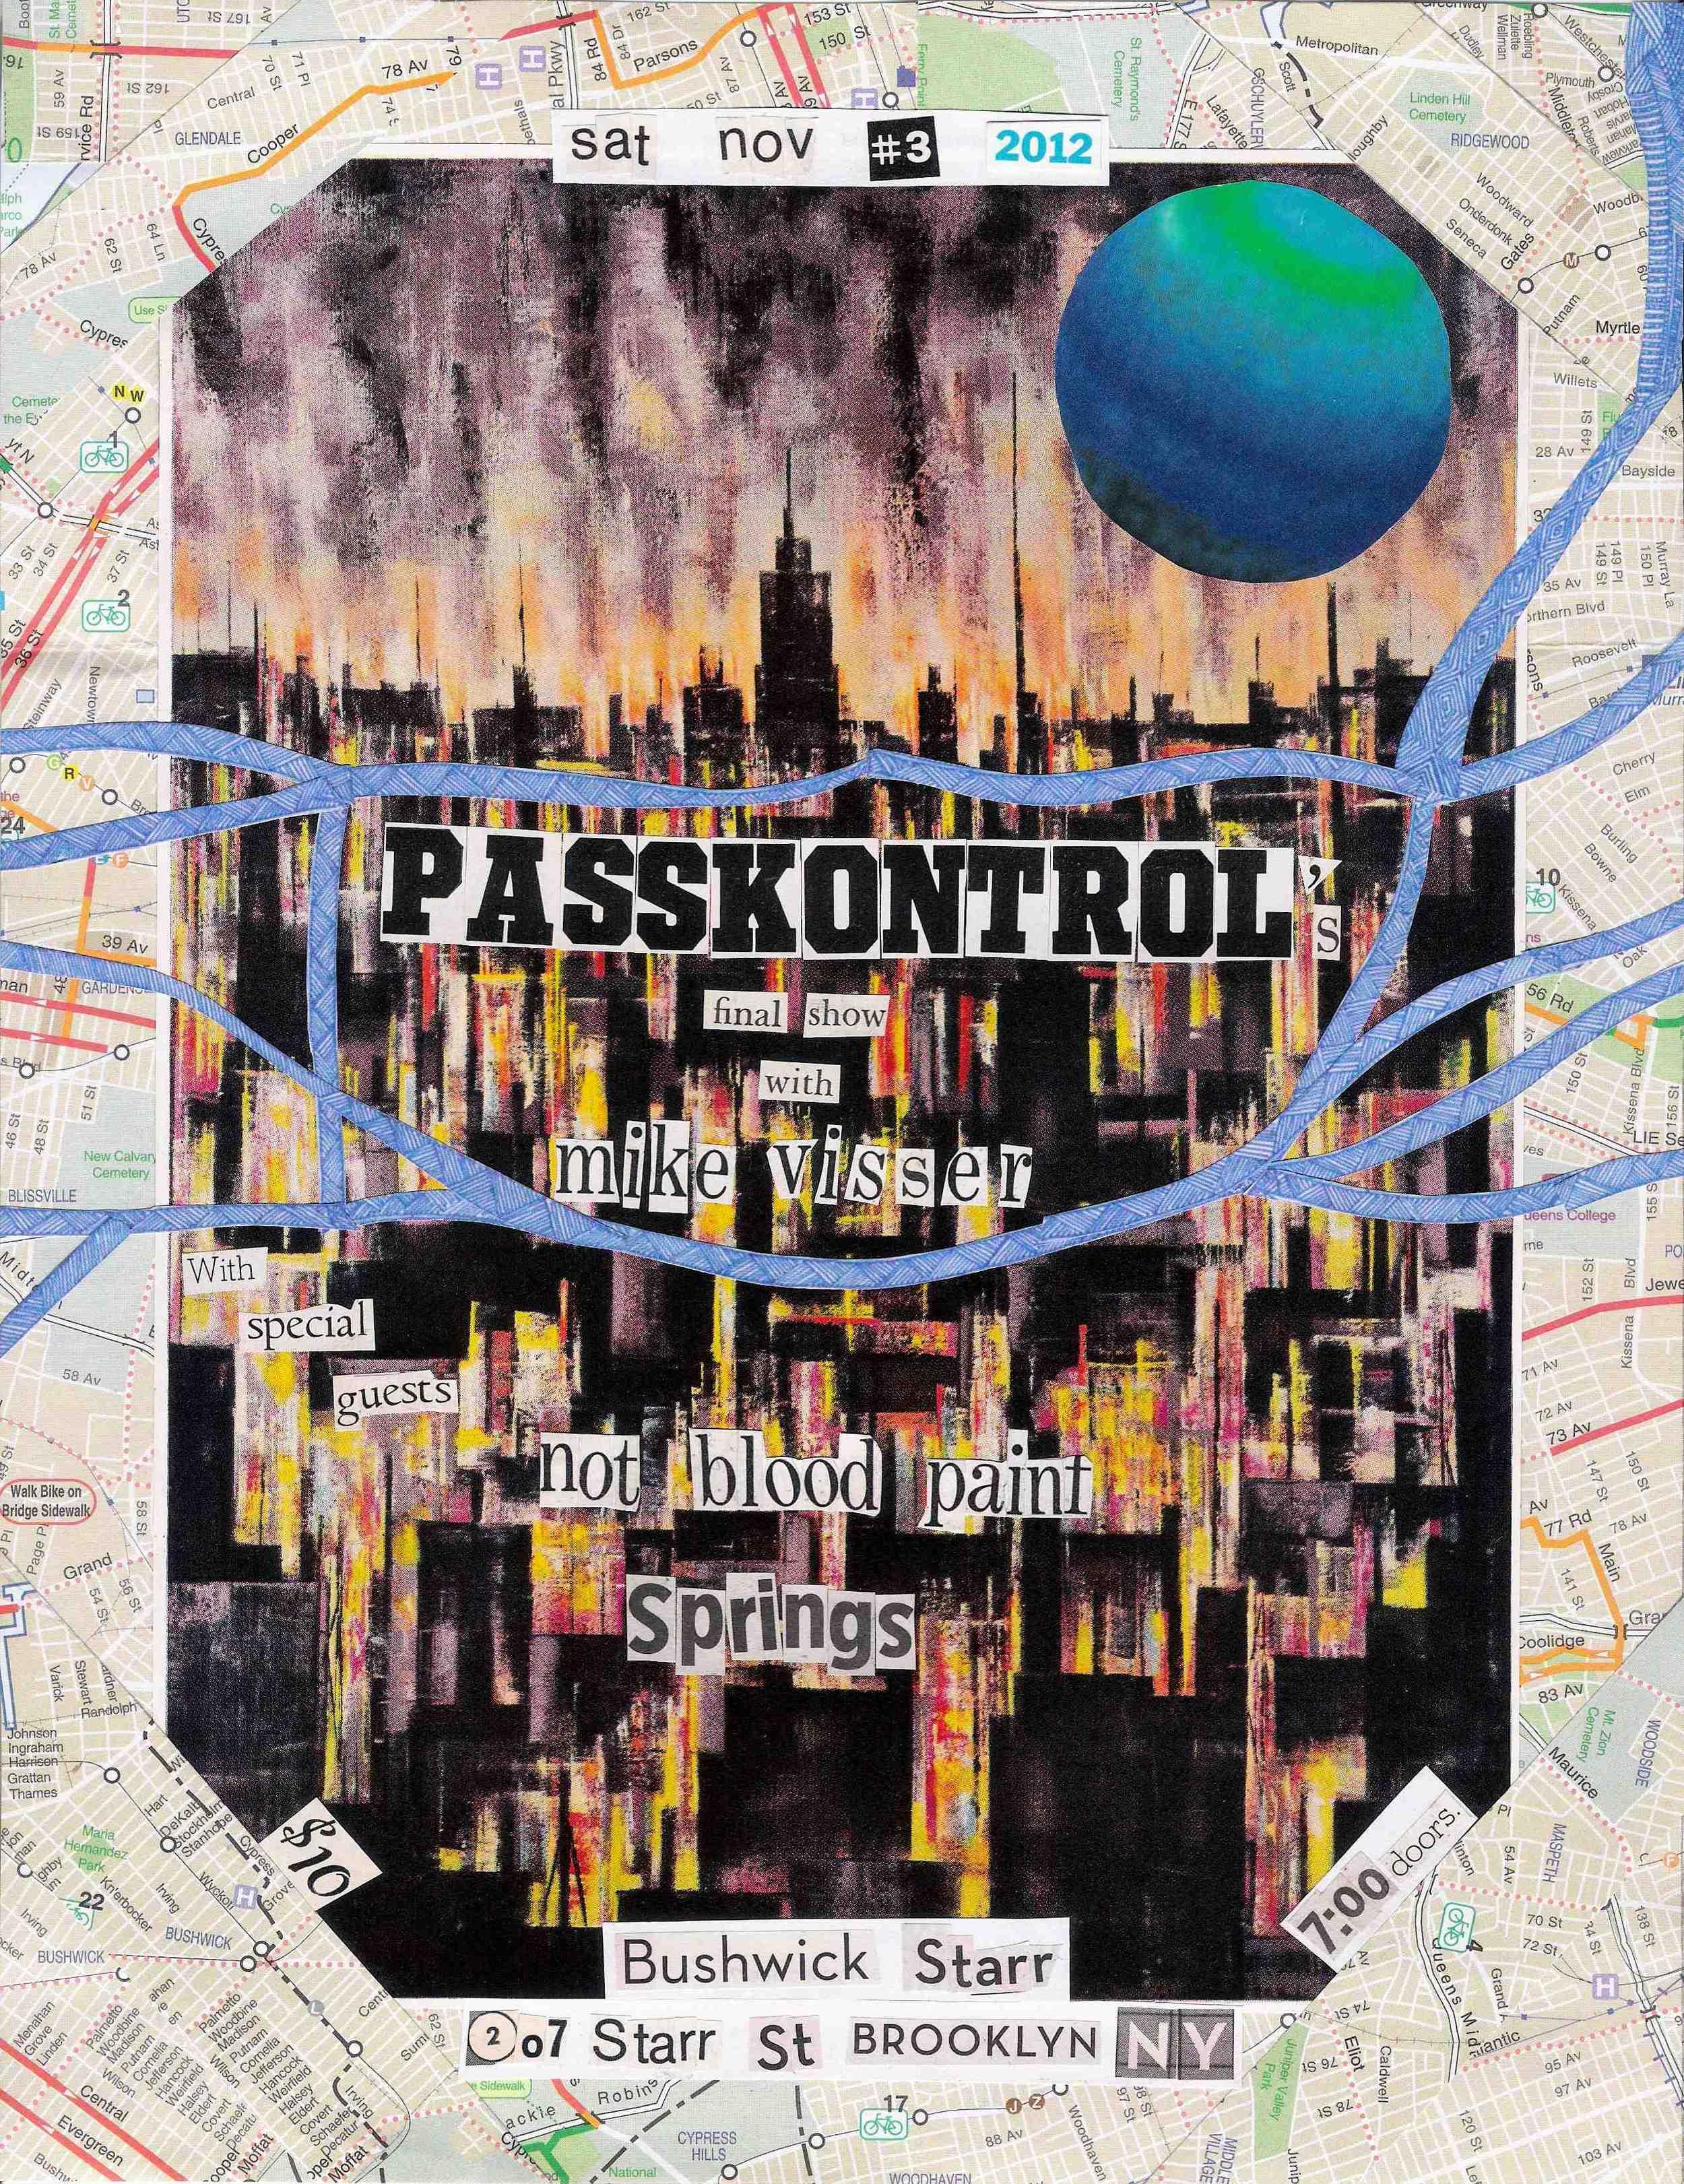 passkontrol_bushwickstarr_11_3_12_website.jpg